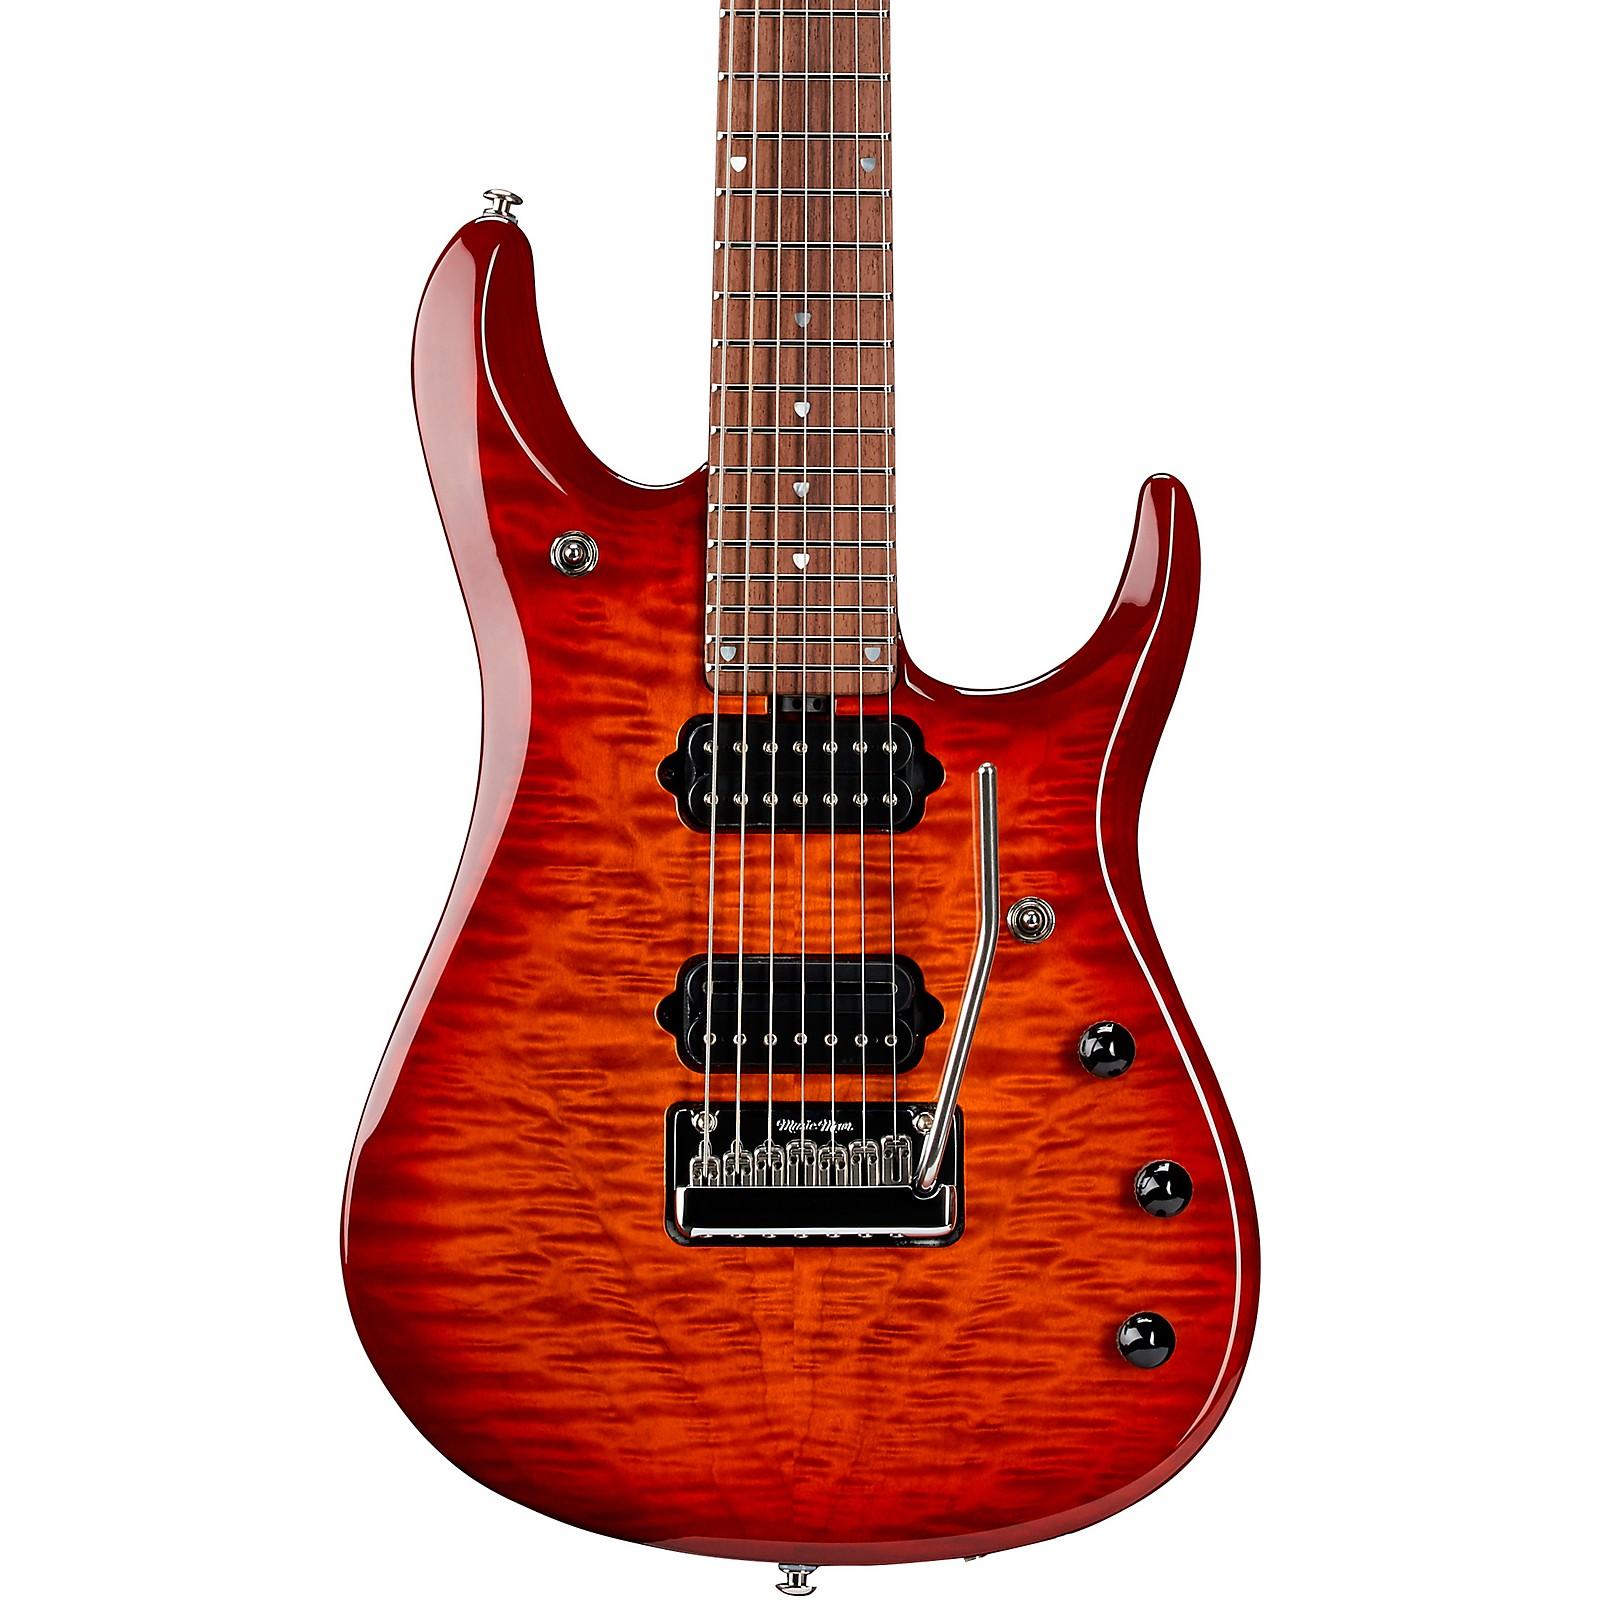 Ernie Ball Music Man John Petrucci 7 JP7 Flame Maple Top Rosewood Fingerboard Electric Guitar